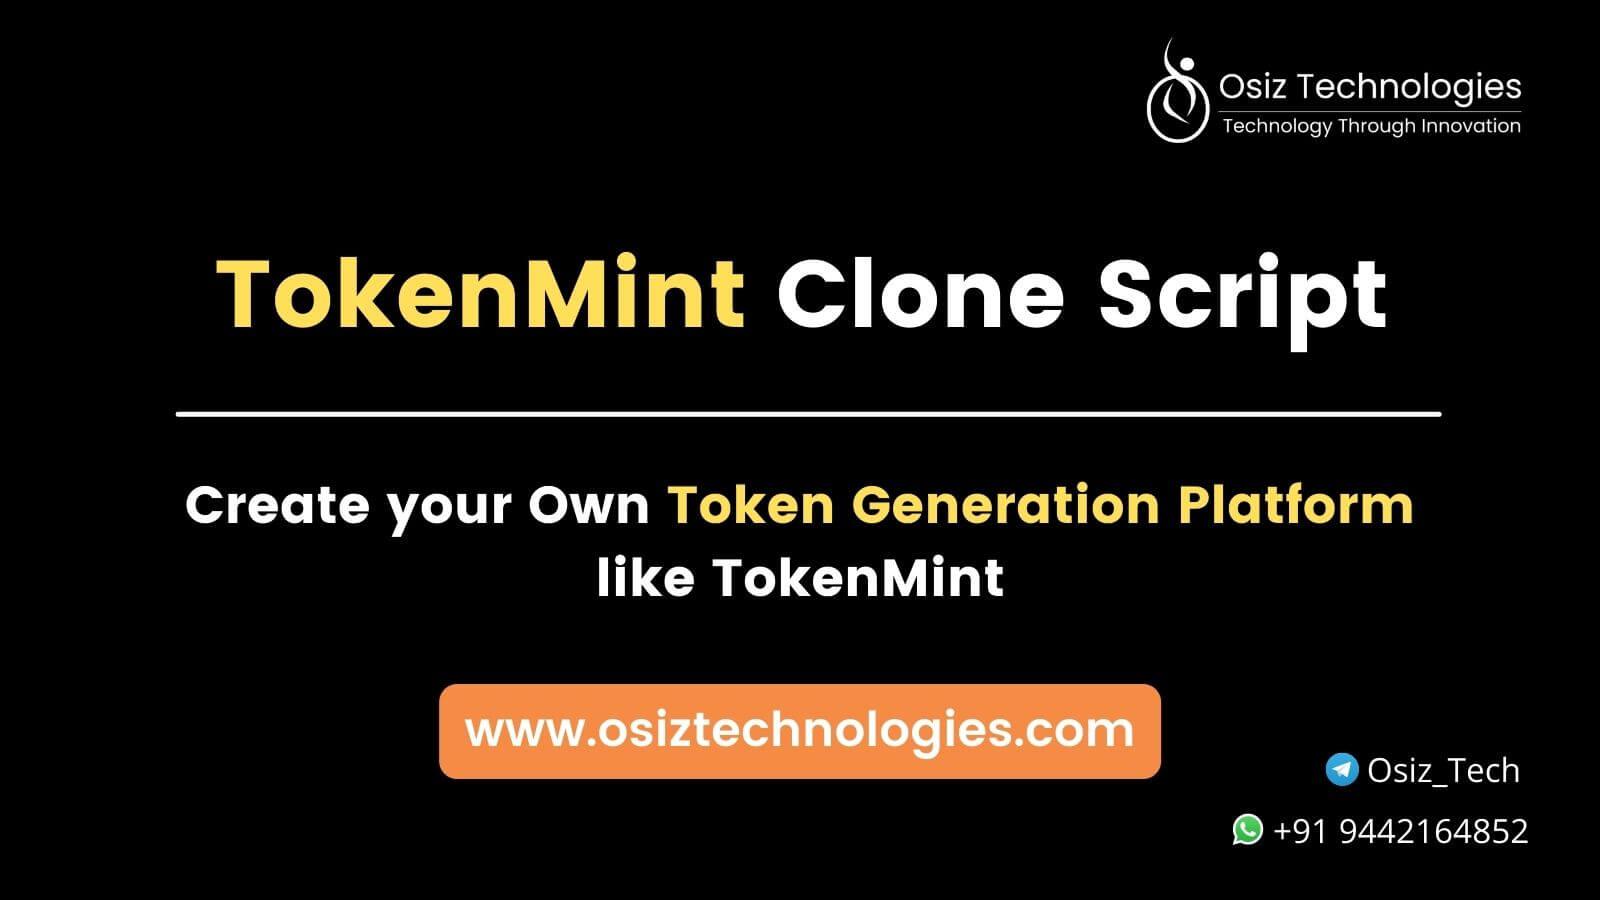 Tokenmint clone script